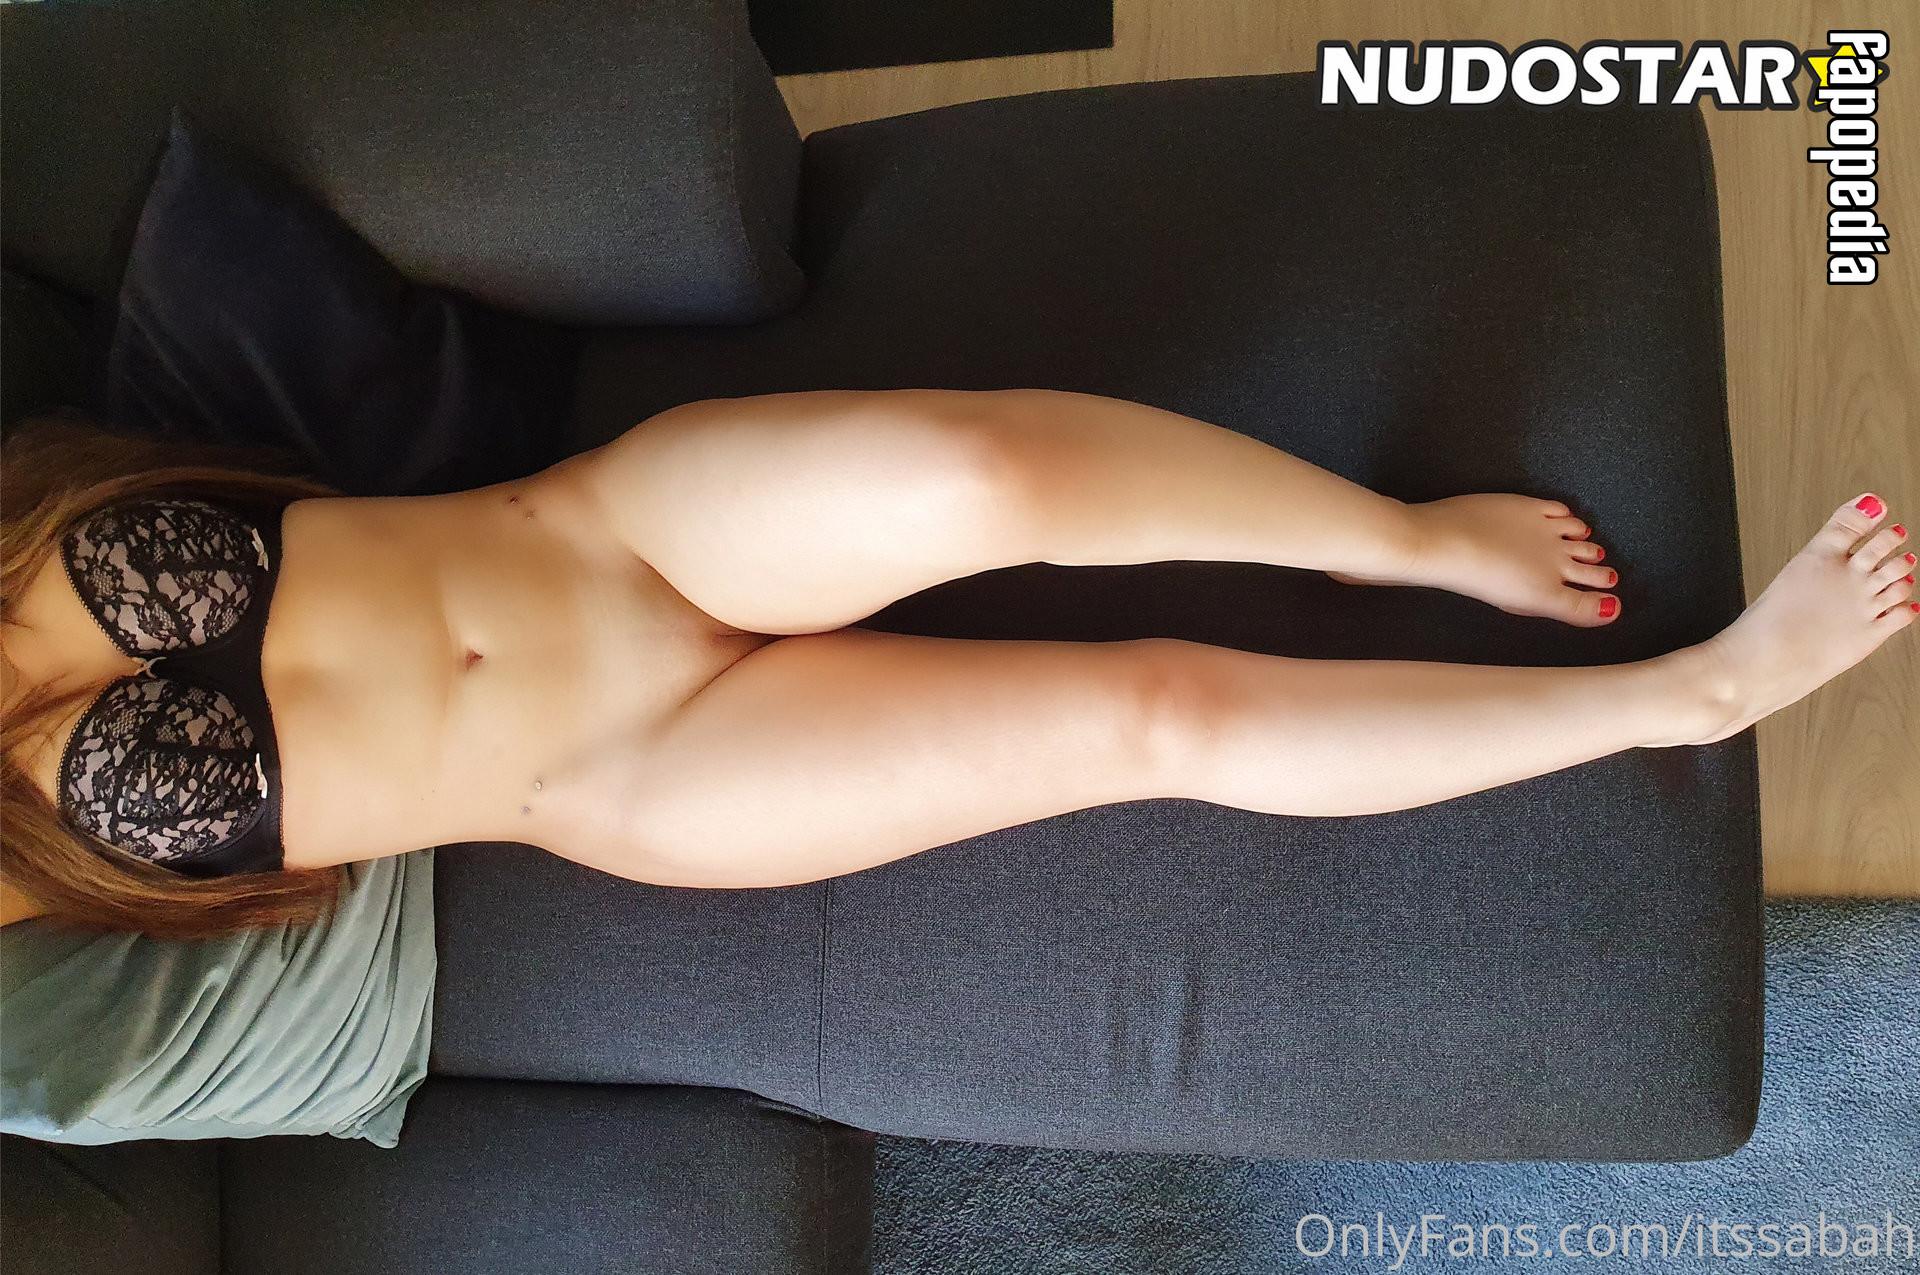 Itssabah Nude OnlyFans Leaks